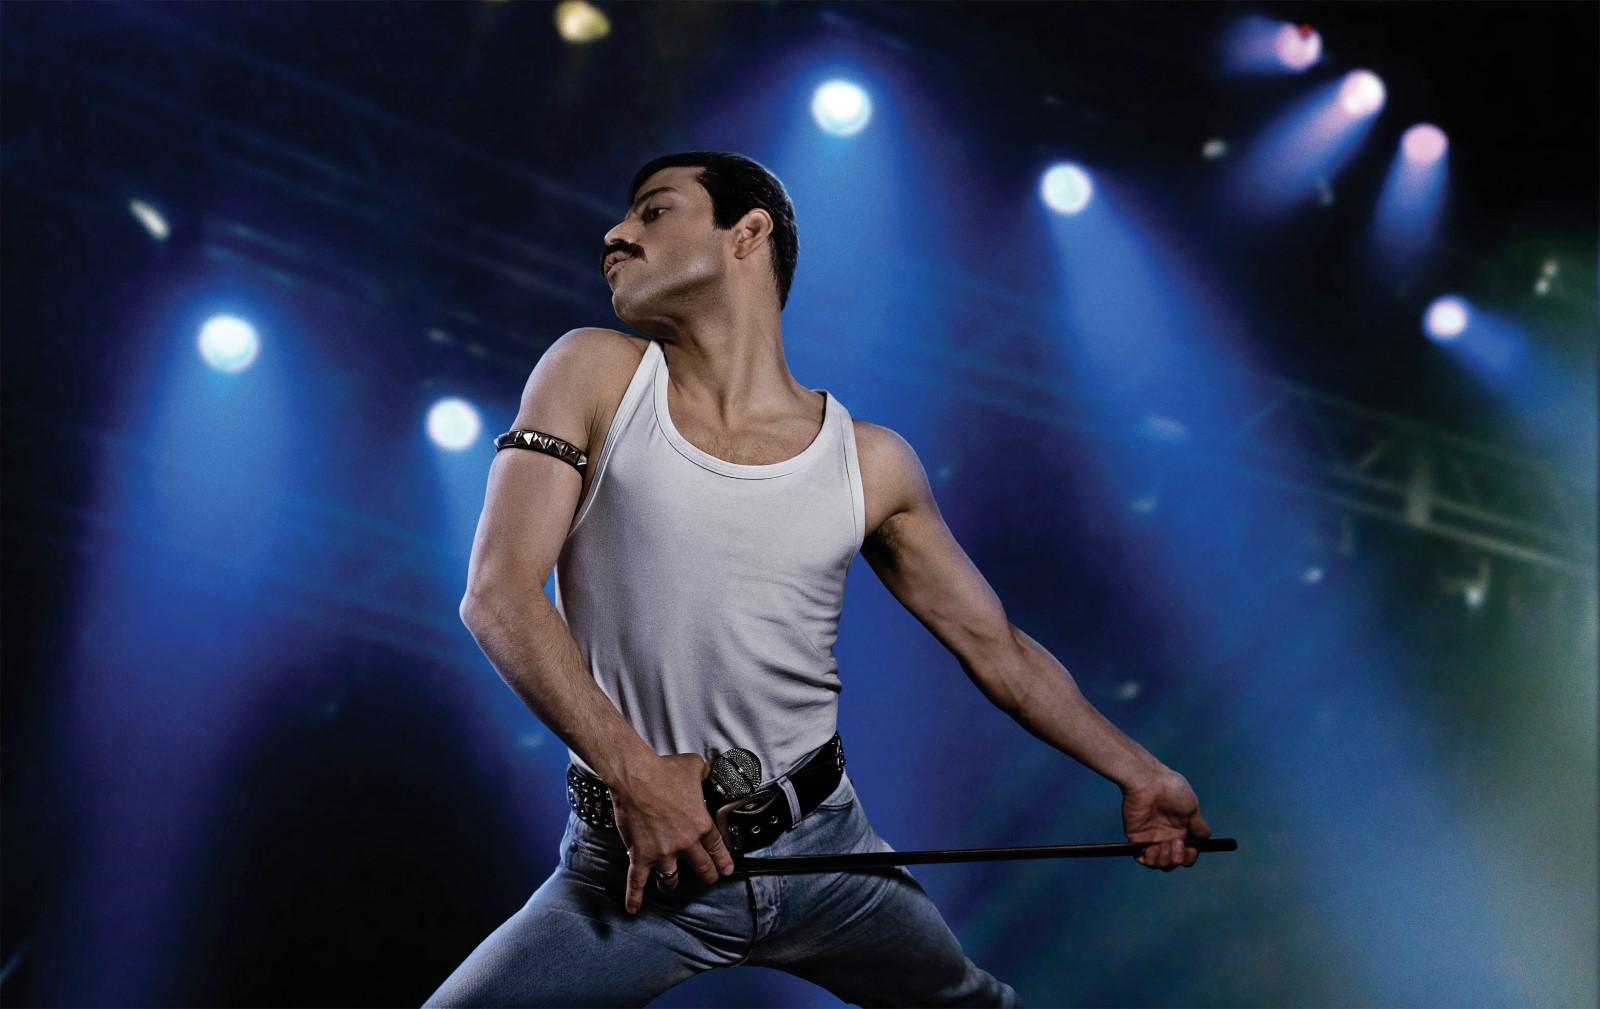 MEILLEUR ACTEUR - DRAME  Bradley Cooper – A Star is Born Willem Dafoe – At Eternity's Gate Lucas Hedges – Boy Erased  Rami Malek – Bohemian Rhapsody  John David Washington – BlackKklansman